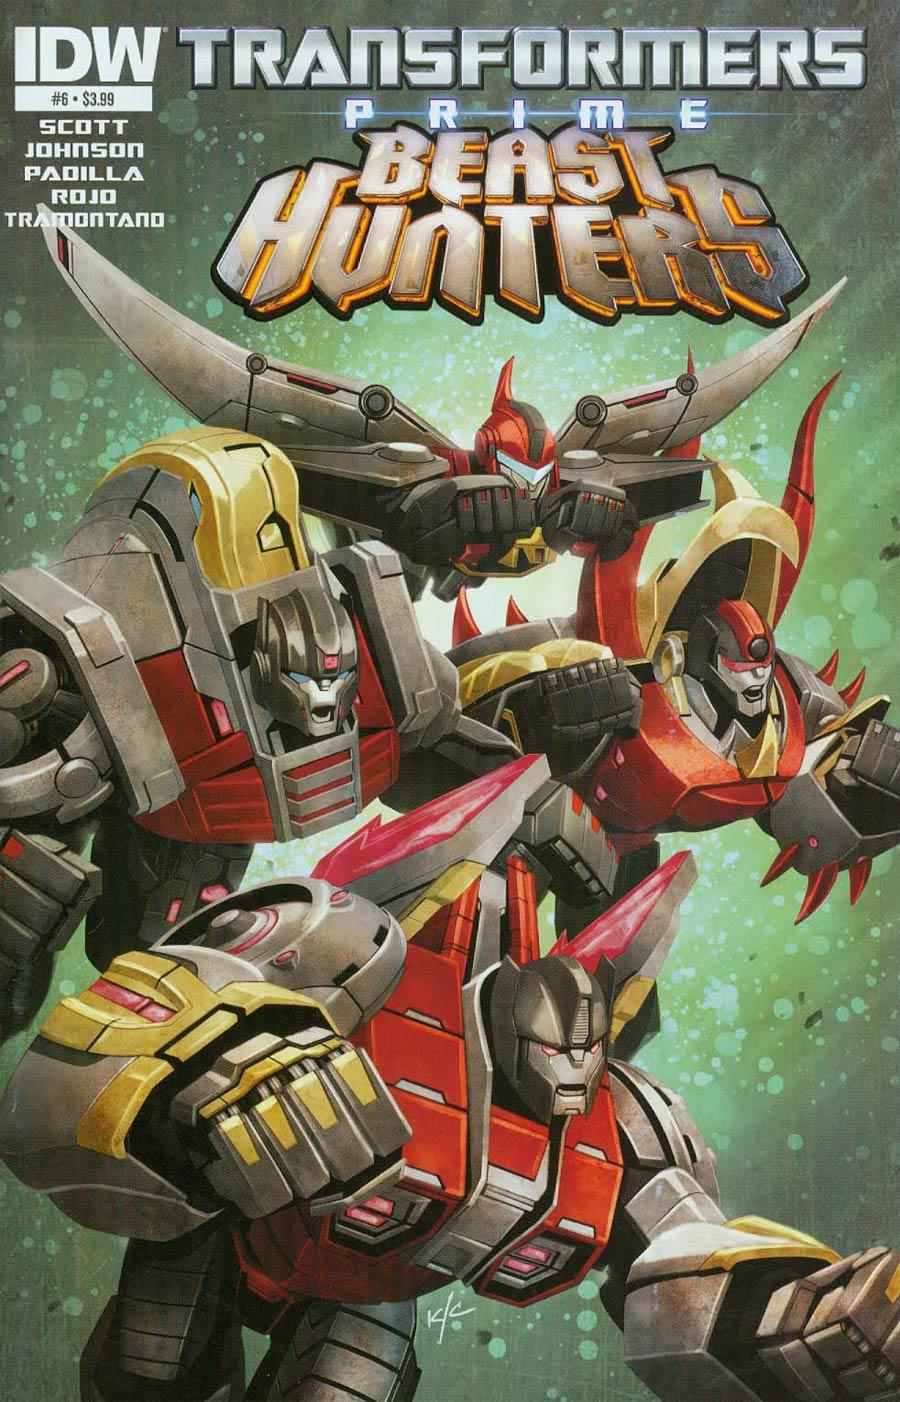 Transformers Prime Beast Hunters #6 Cover A Regular Ken Christiansen Cover